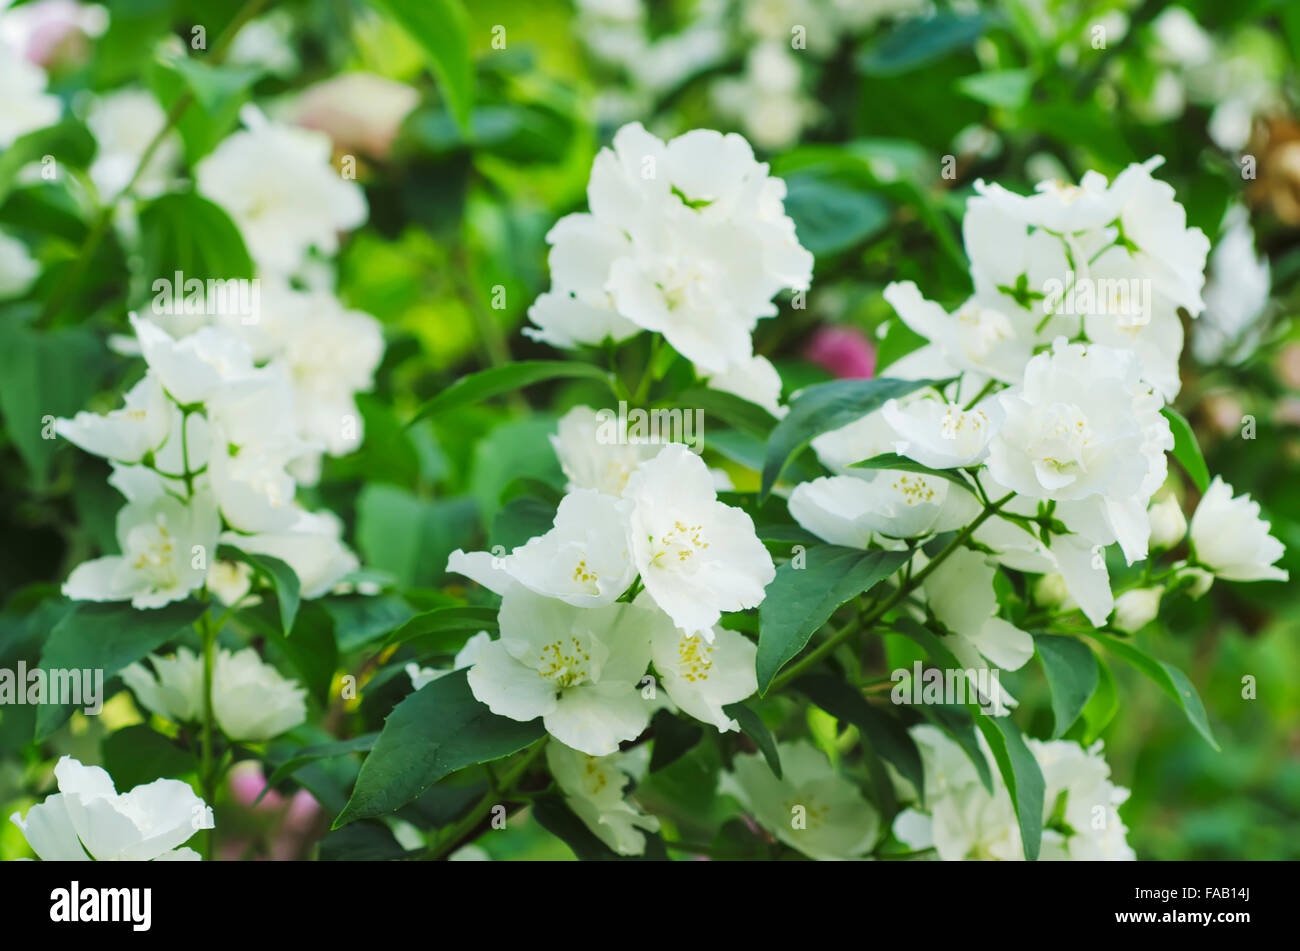 Jasmine Flower White Stock Photos Jasmine Flower White Stock